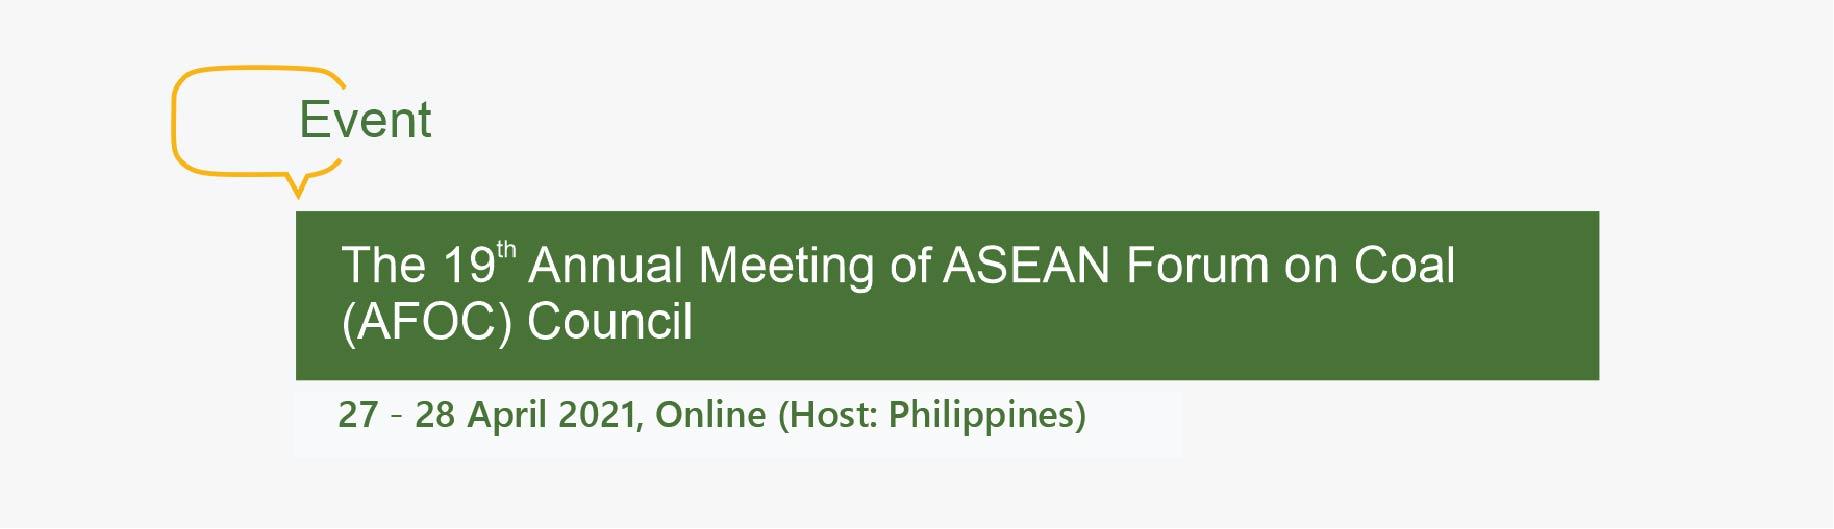 19th ASEAN Forum on Coal Council Meeting